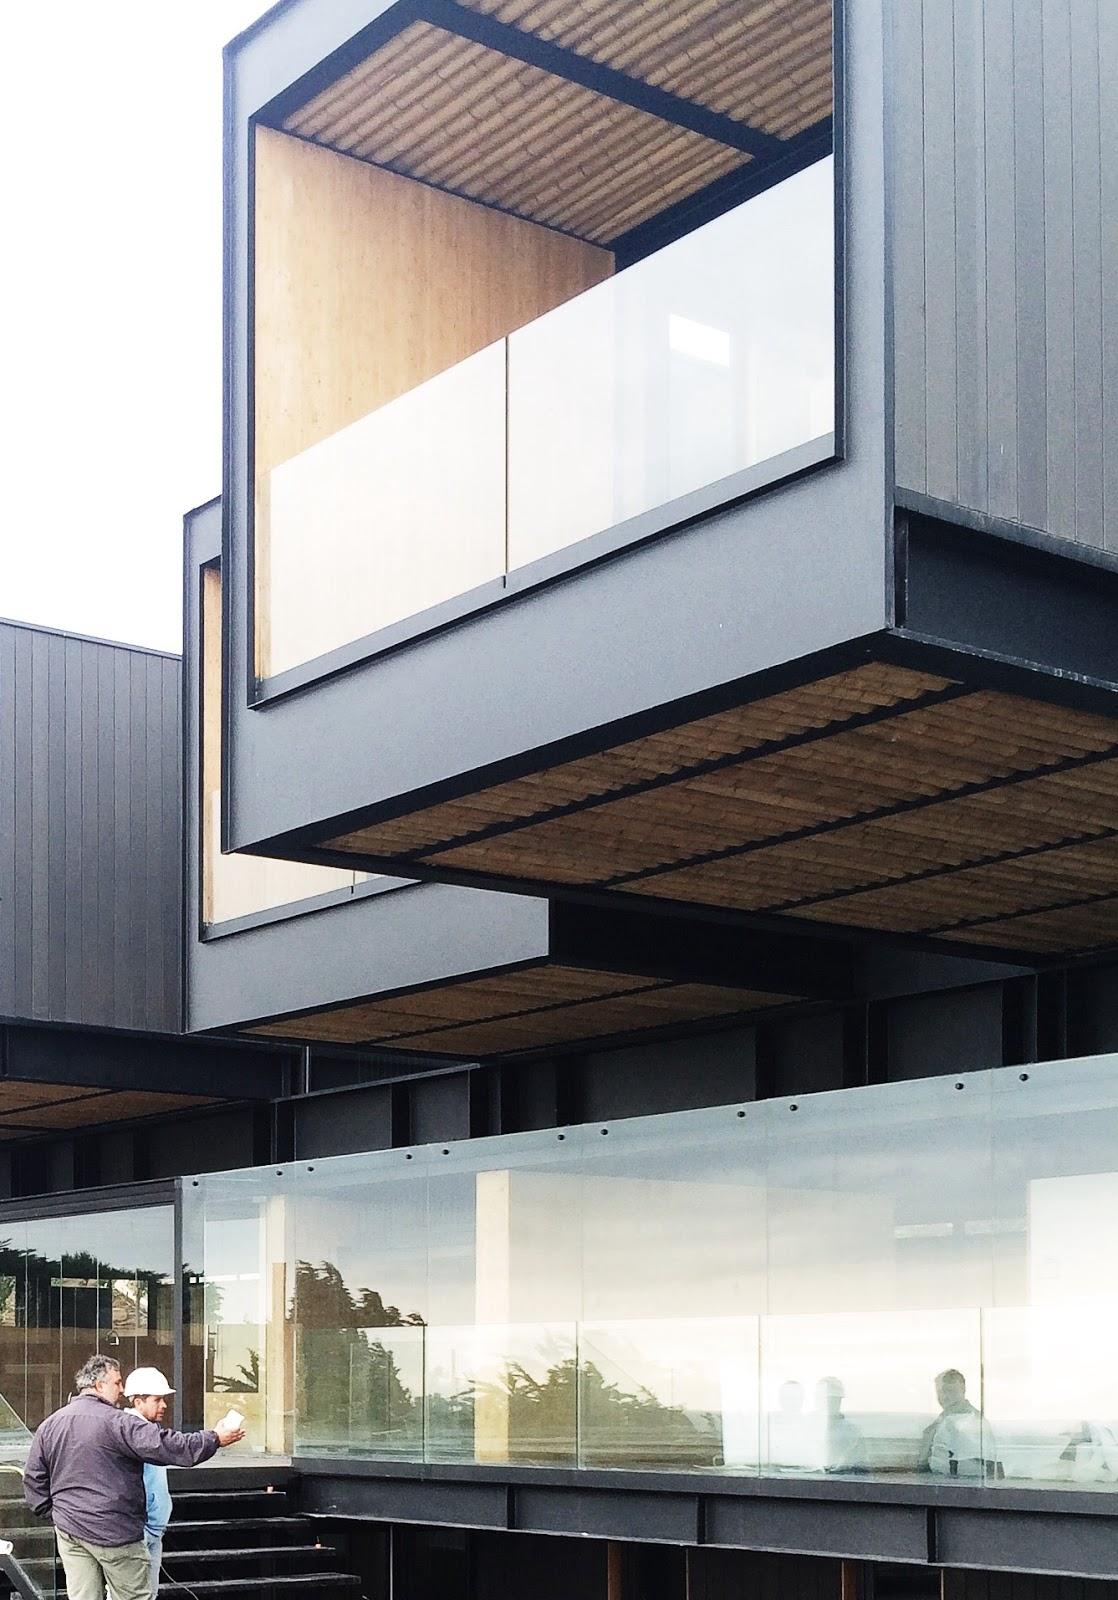 En construccion casa en beranda under construction - Cmi casas modulares ...